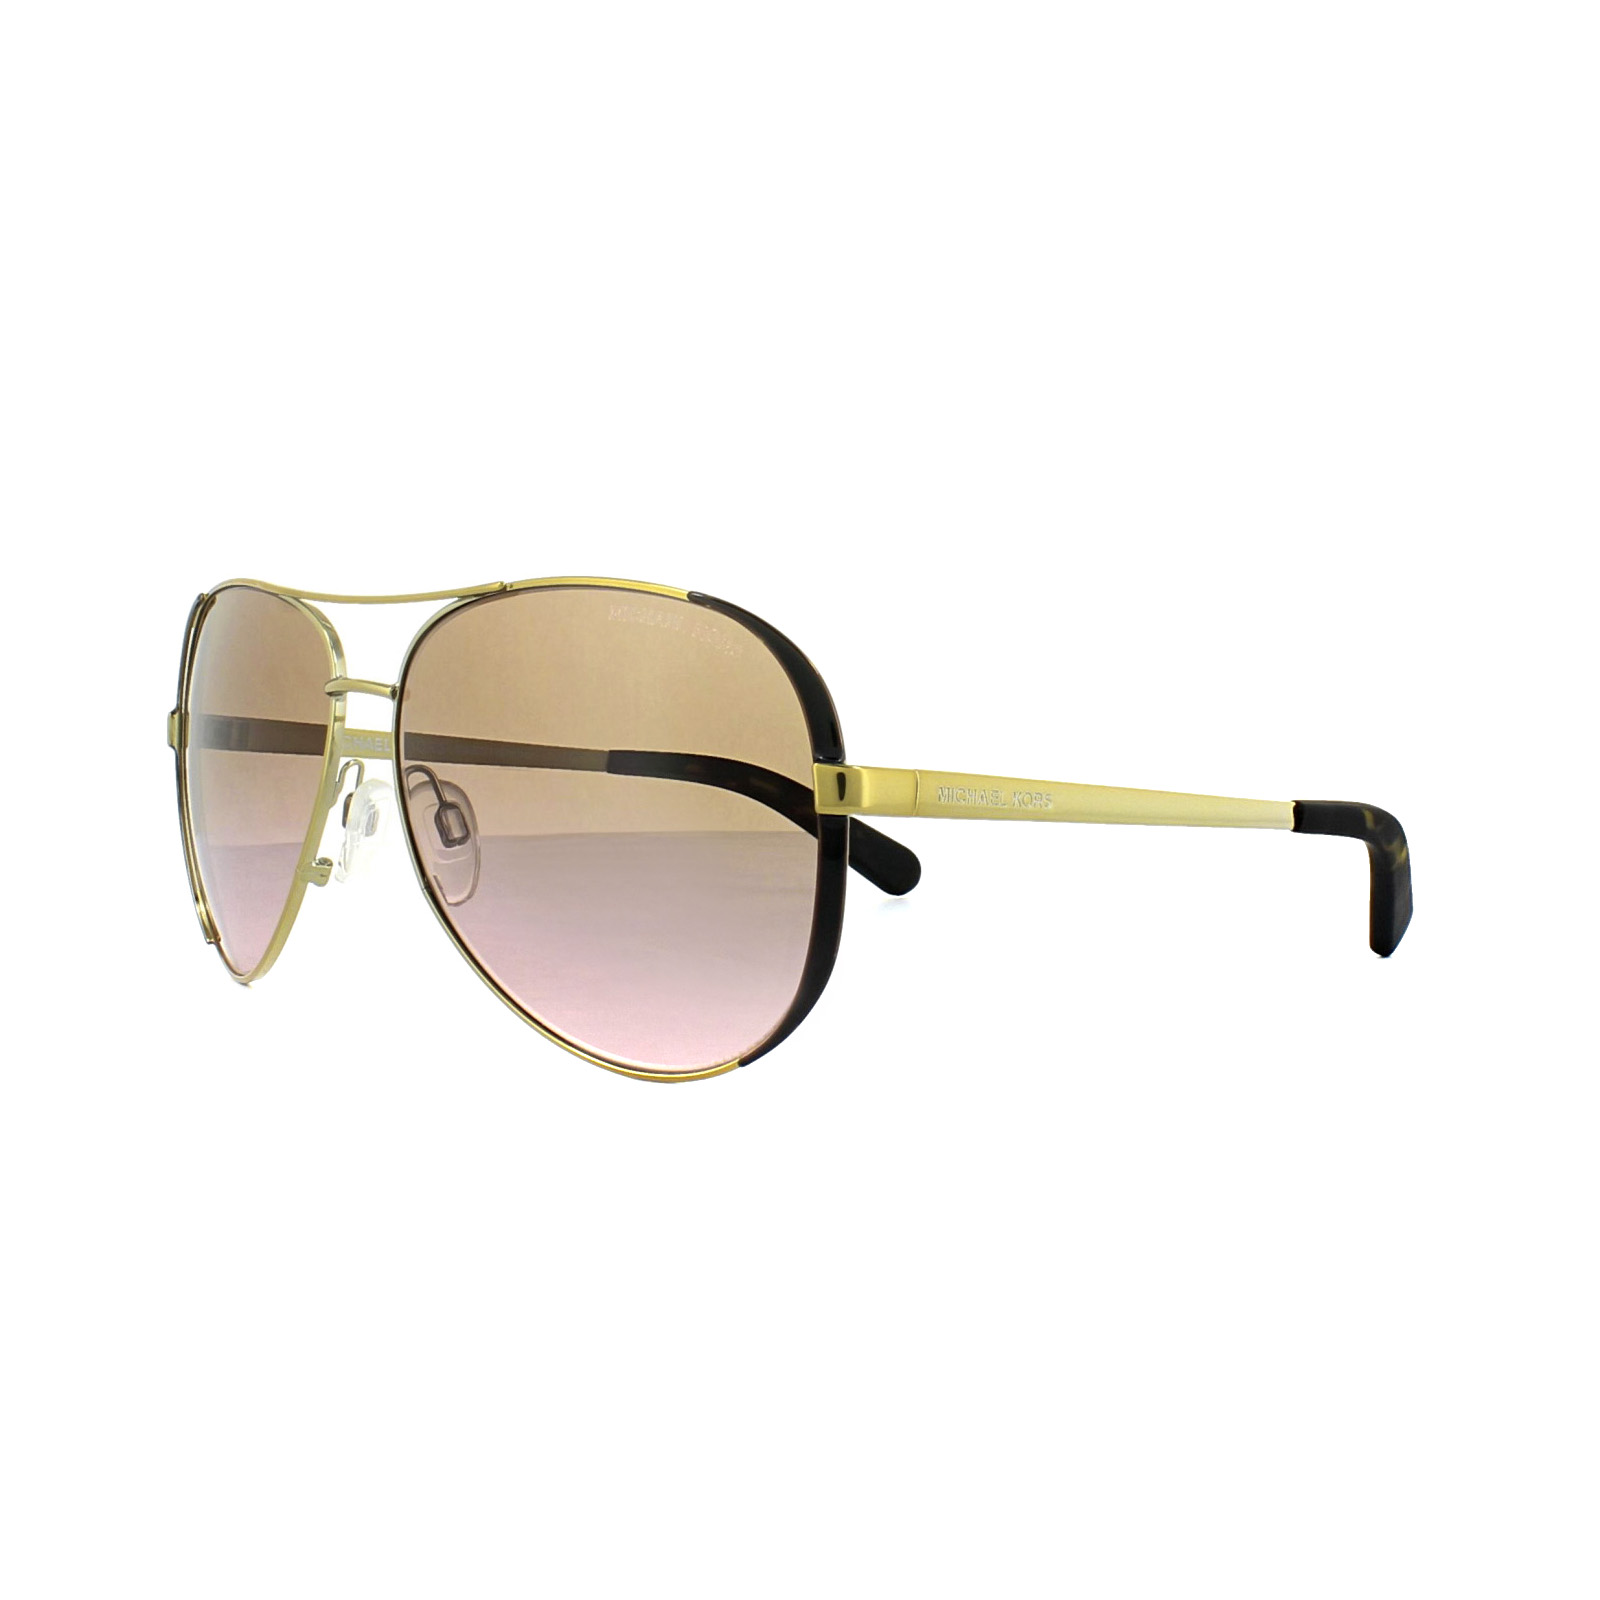 1a54986a5e958 Sentinel Michael Kors Sunglasses Chelsea 5004 1014 14 Gold Dark Chocolate  Brown Rose Grad